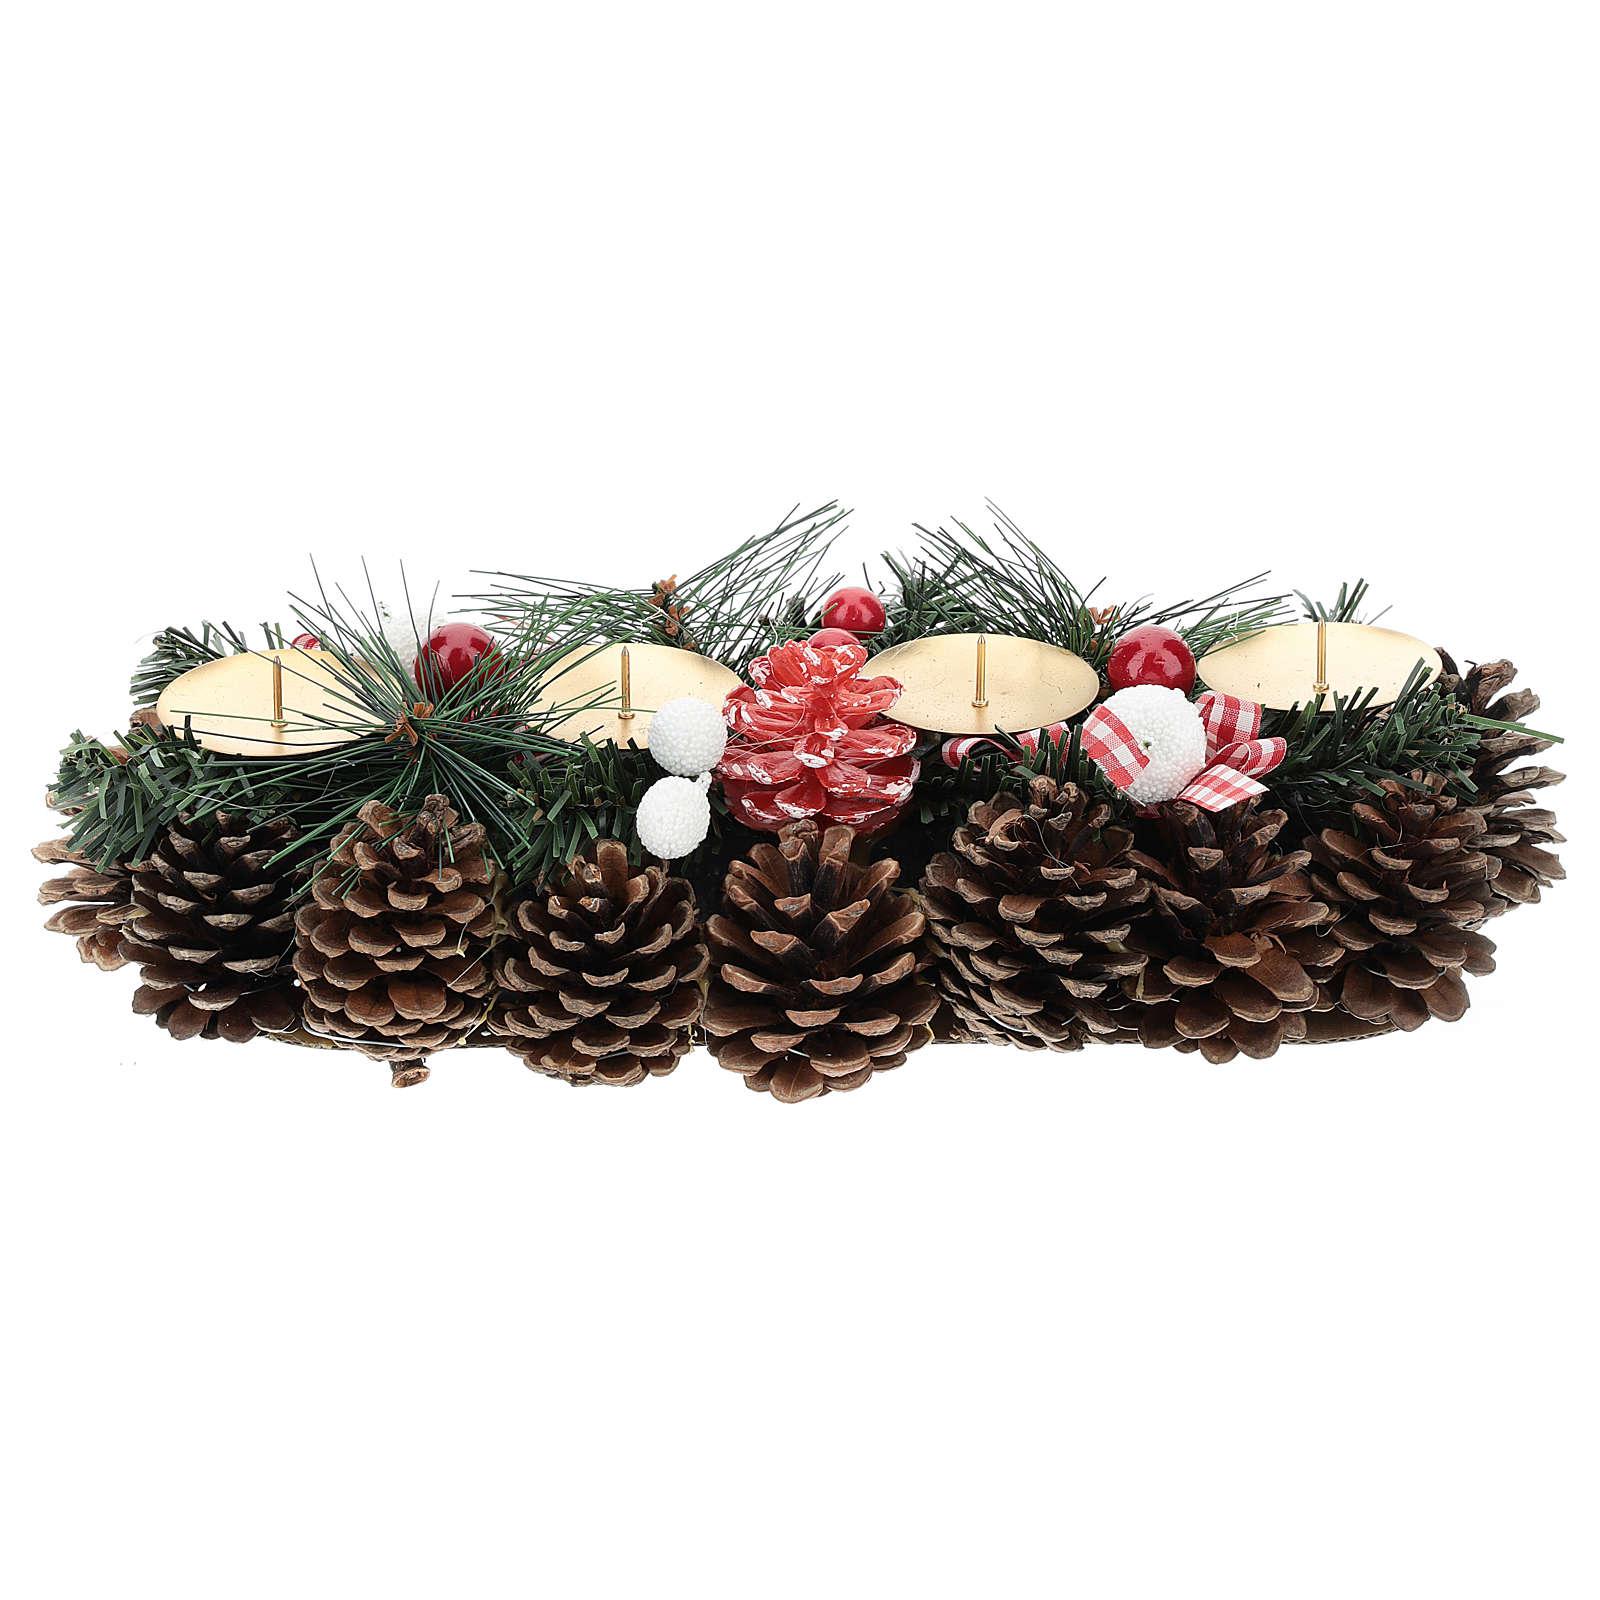 Centrotavola Natale con punzoni e pigne 30 cm 3